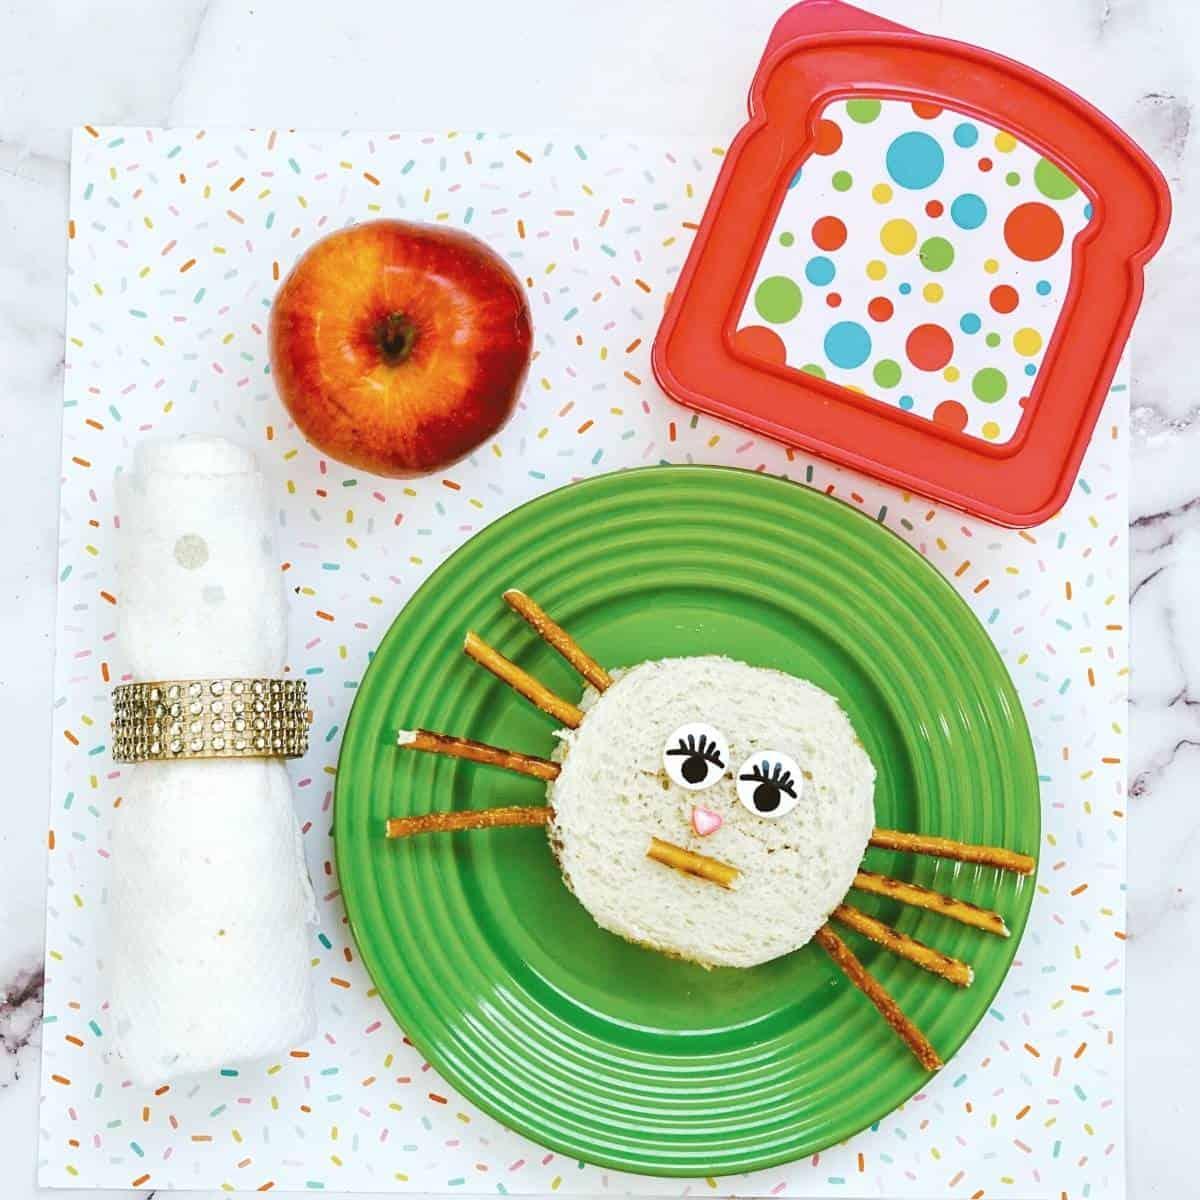 Ways to Make School Lunch Fun